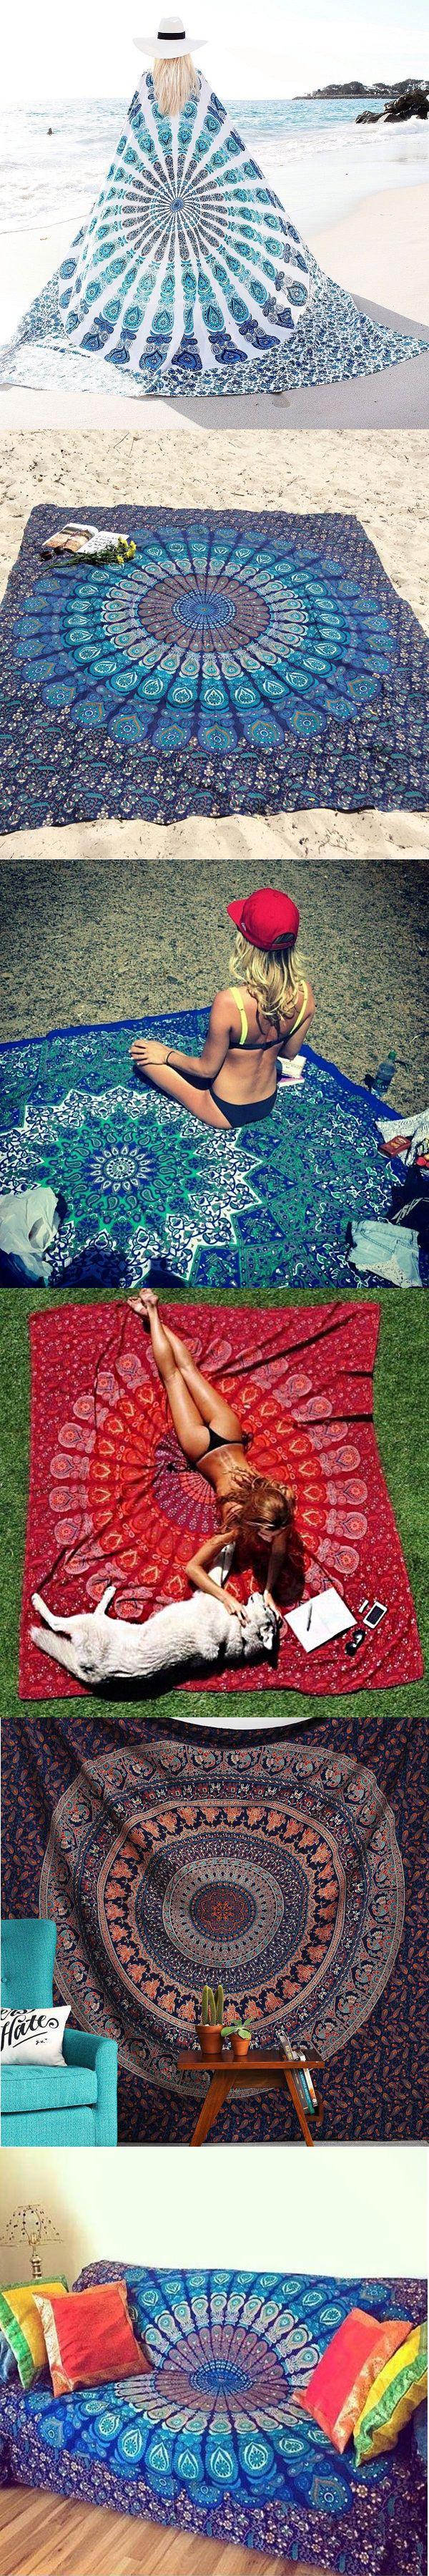 150x210cm Bohemian Style Thin Chiffon Beach Yoga Towel Mandala Rectangle Bed Sheet Tapestry